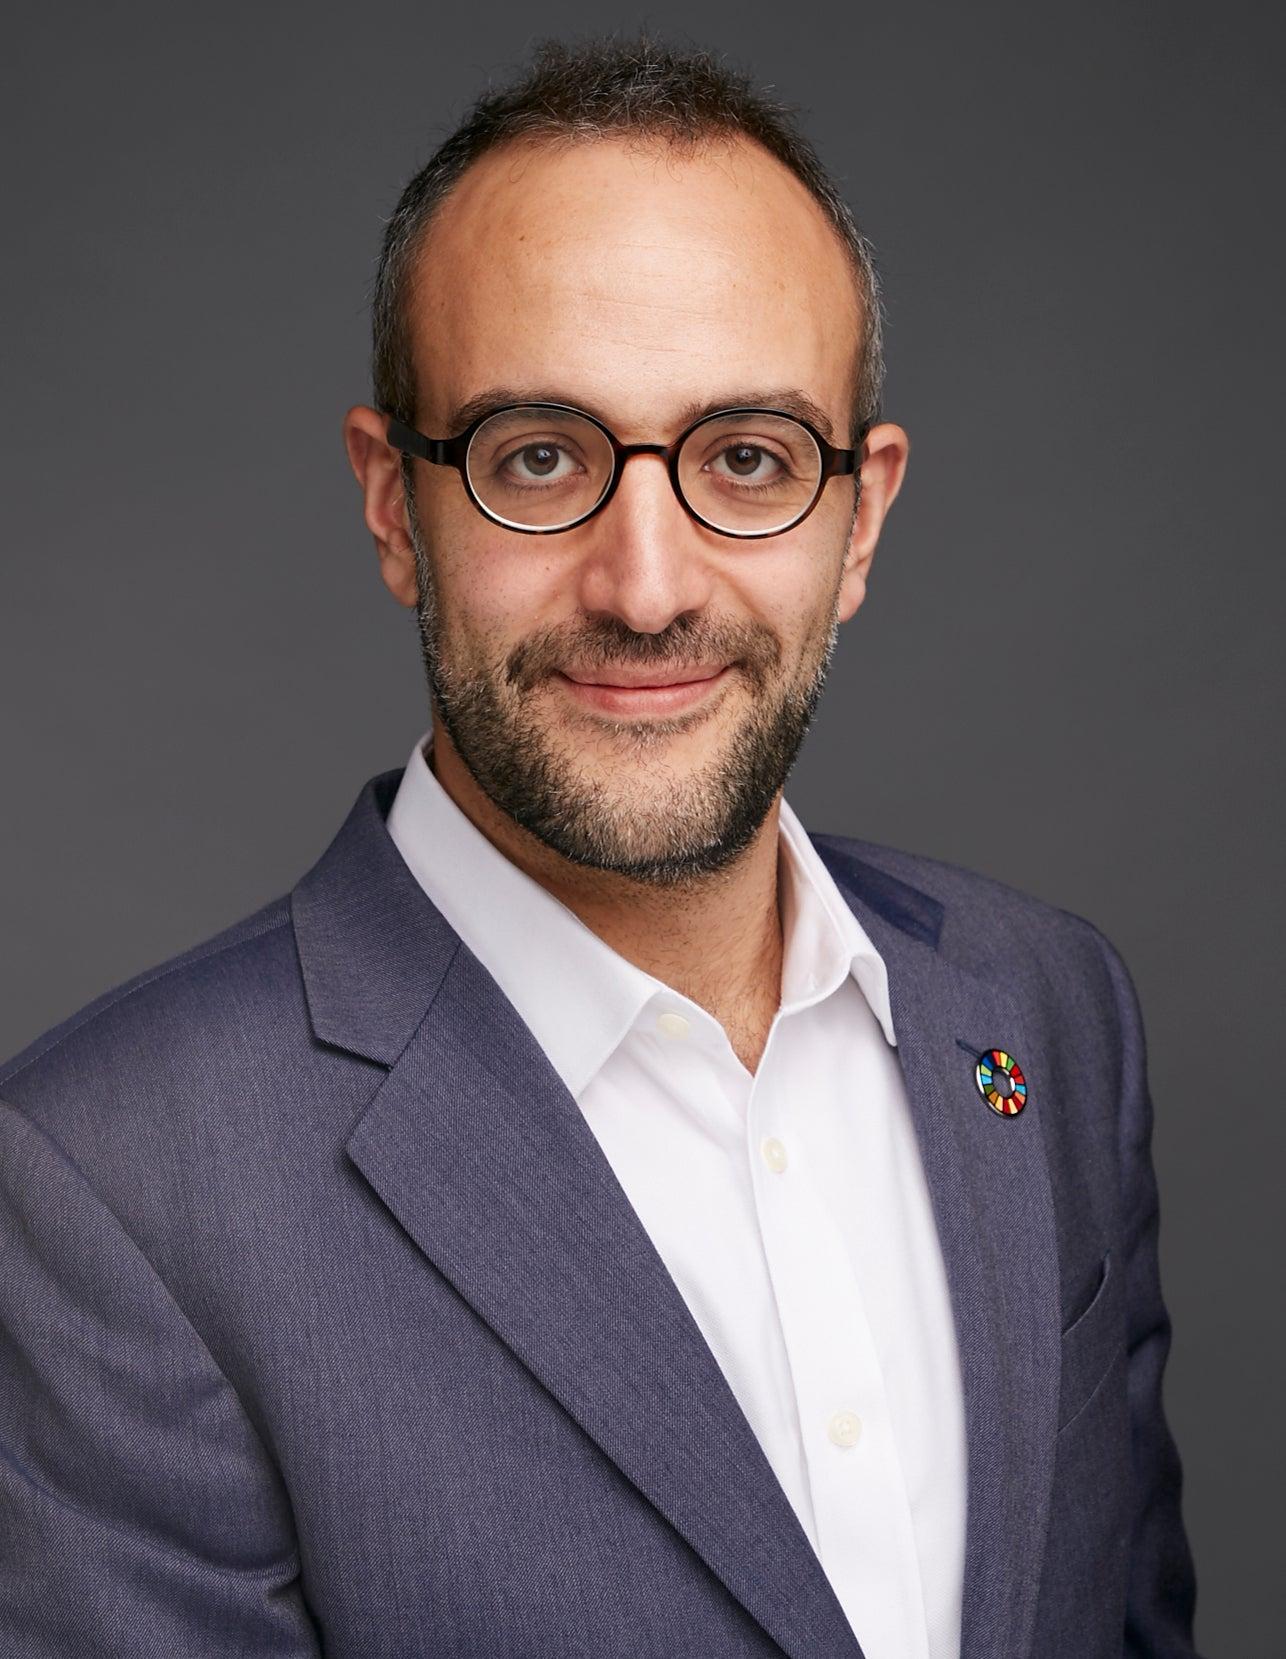 Headshot of Elie Chachoua